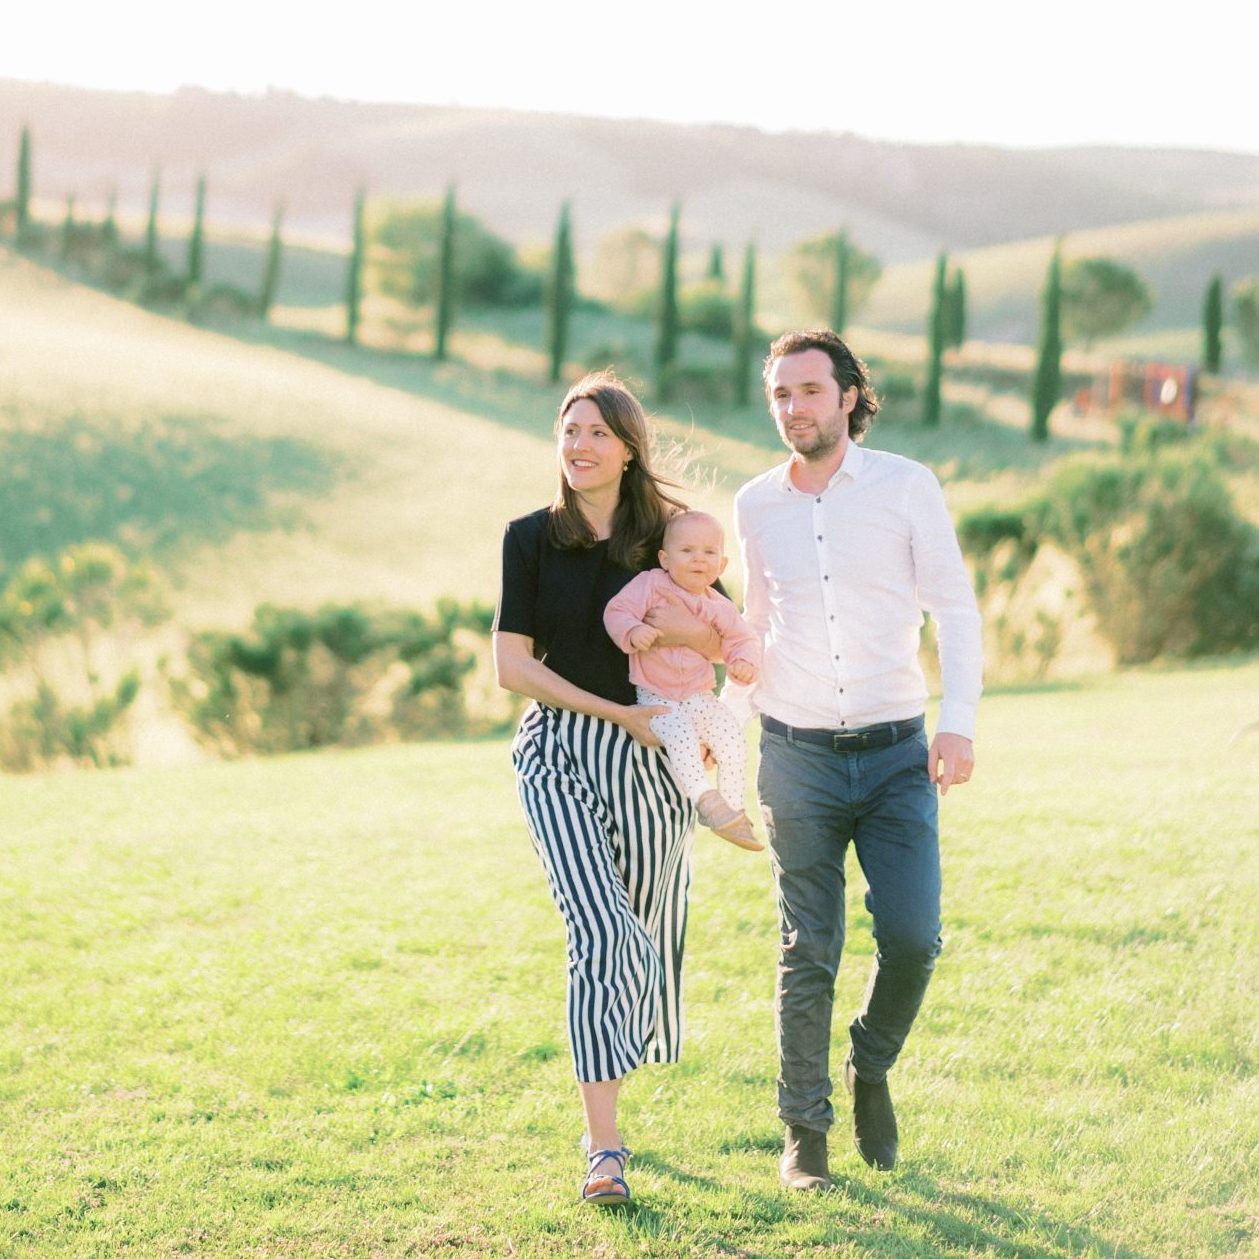 Agriturismo Il Rigo, Family Photoshoot Tuscany